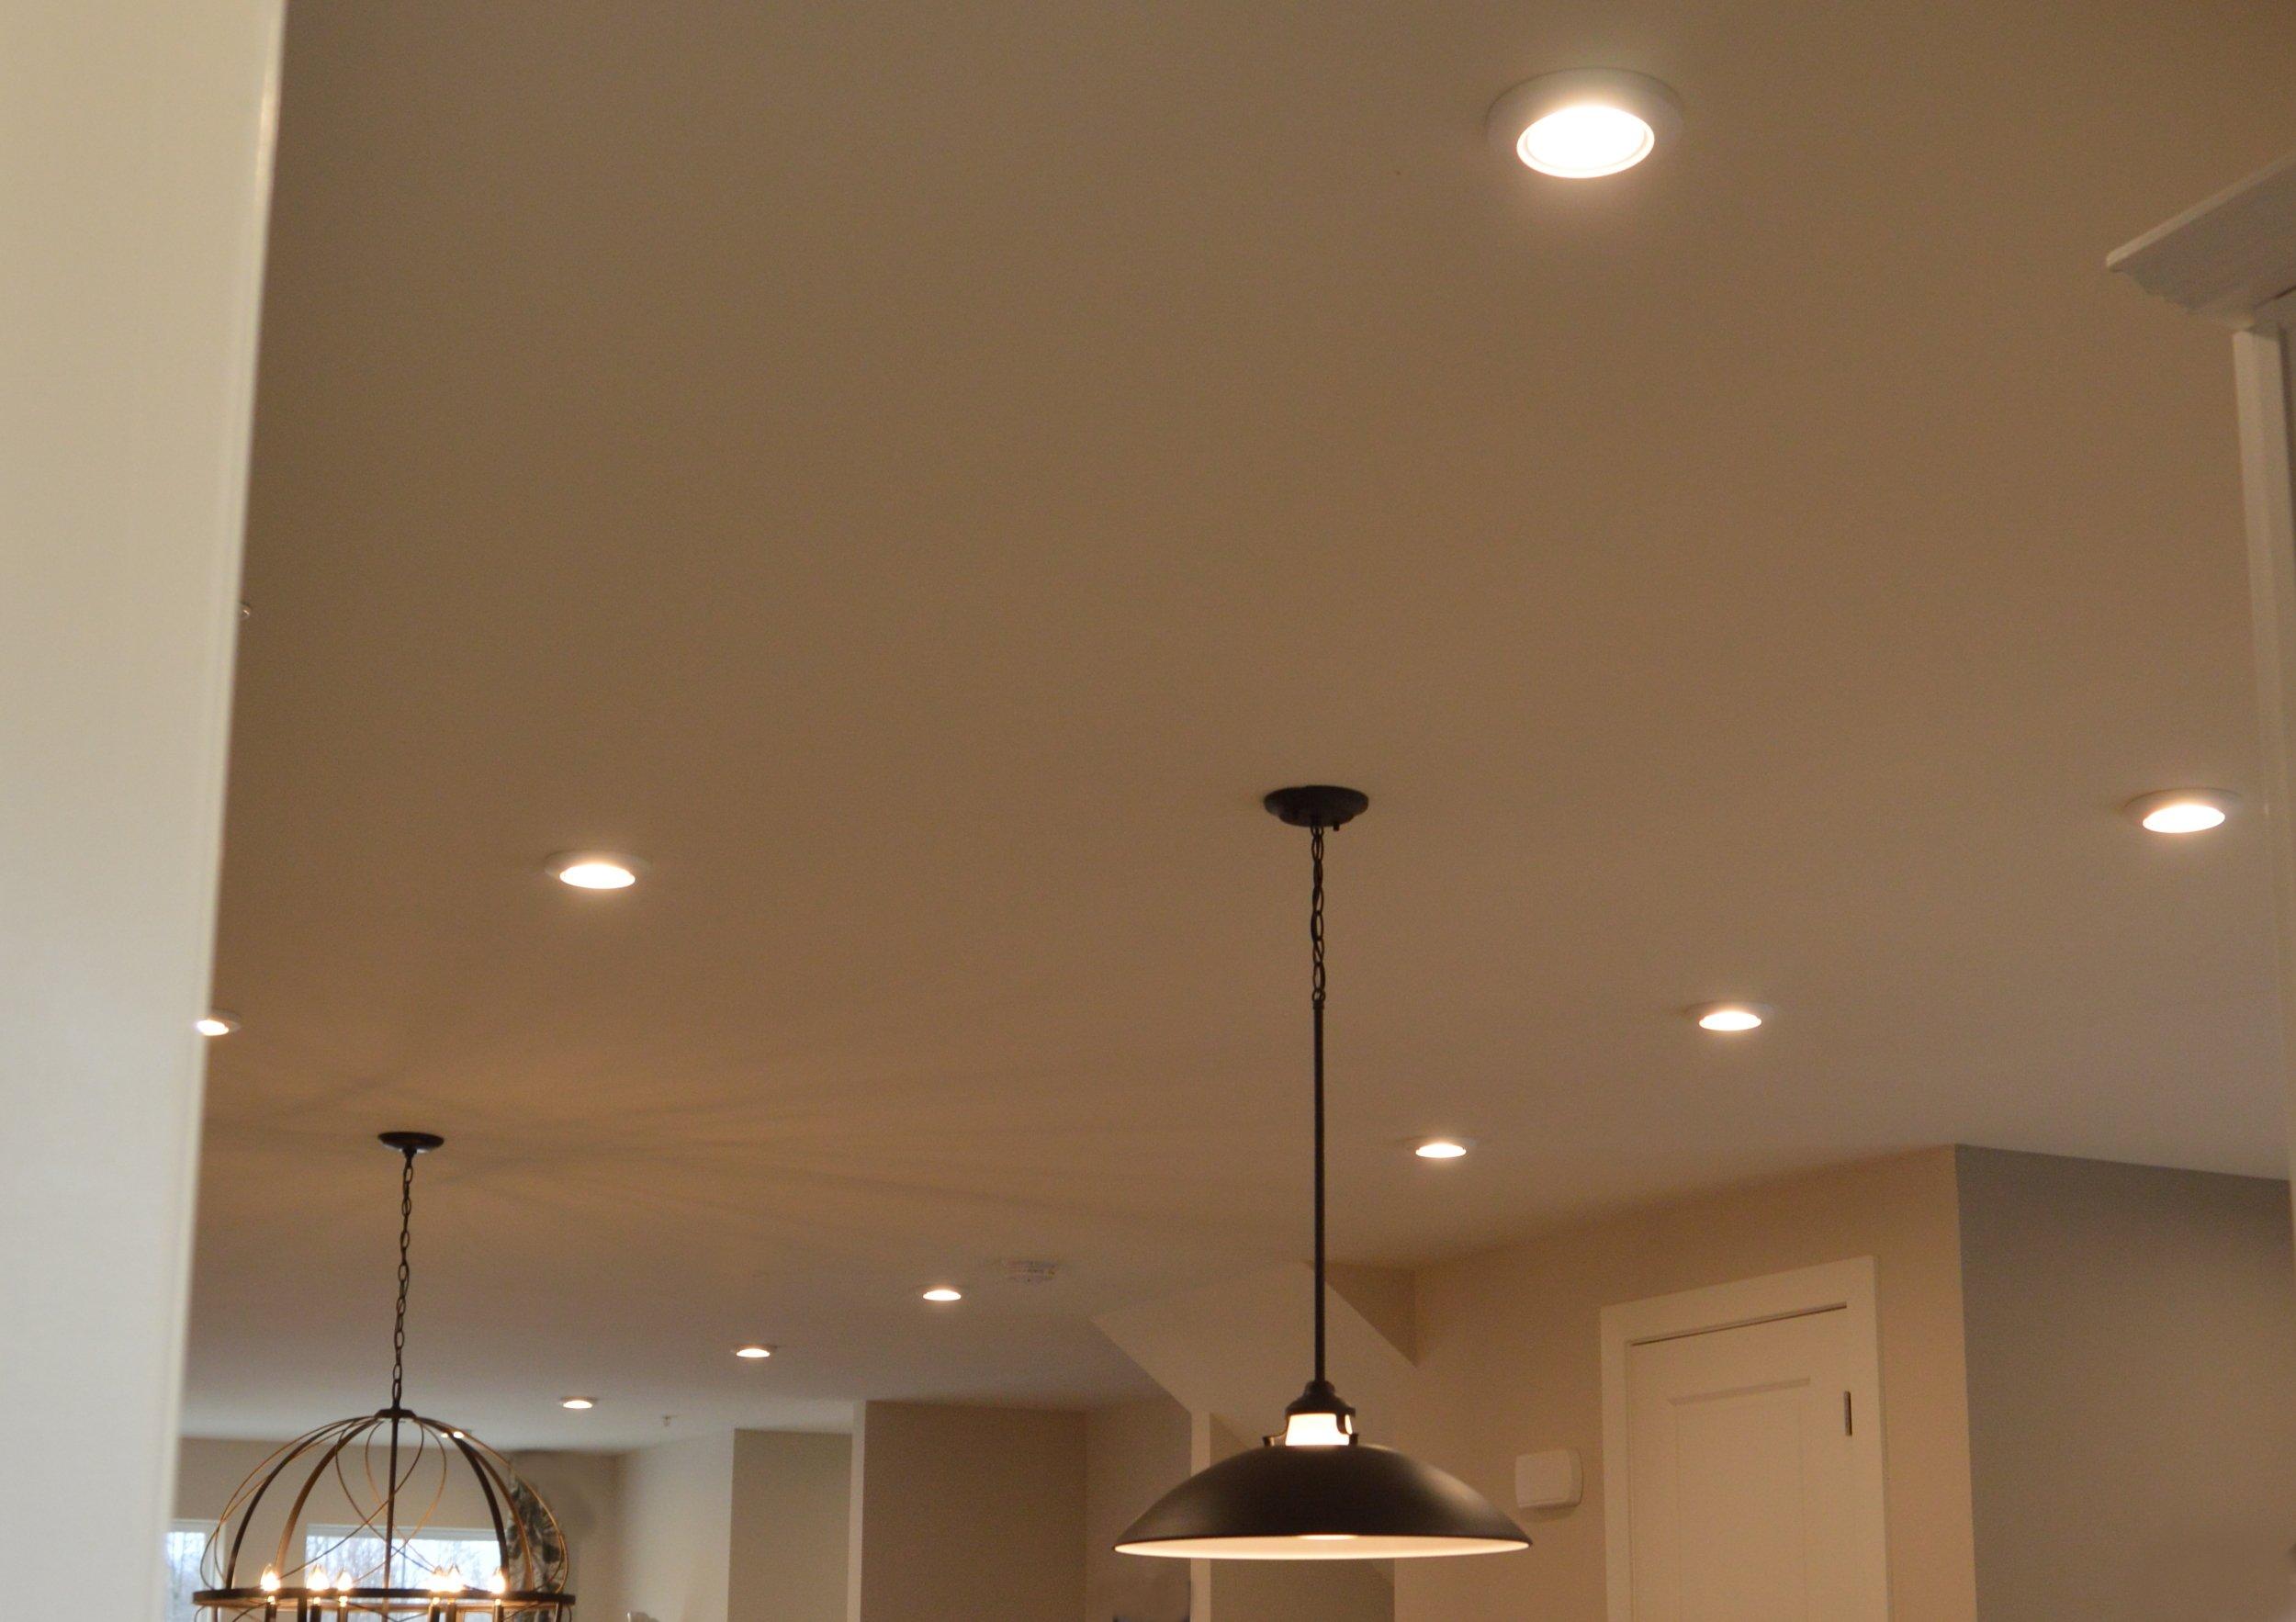 Lighting Electricians Severna Park MD, 21146